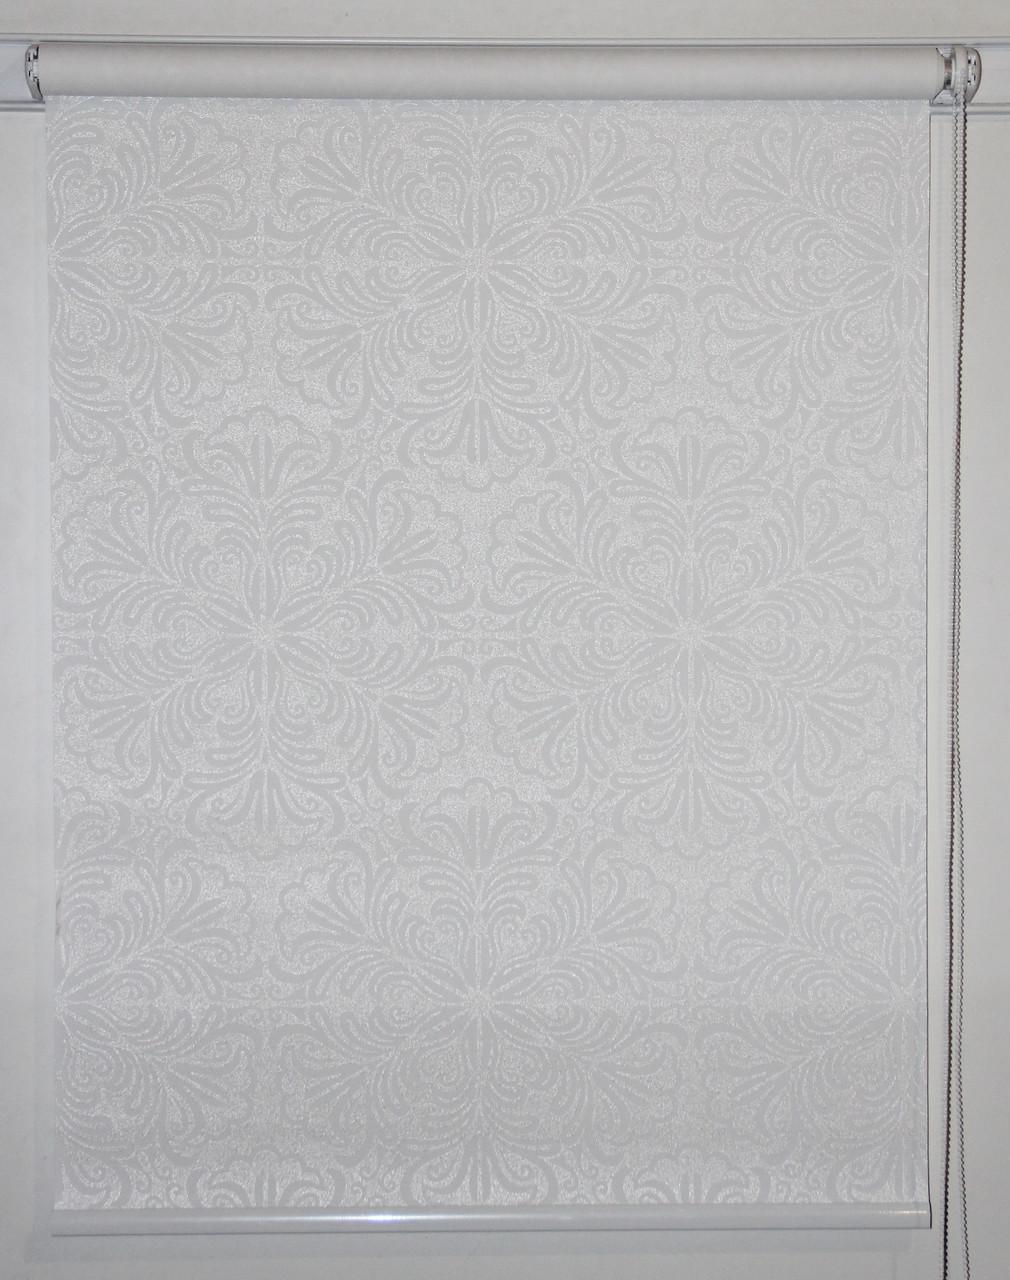 Готовые рулонные шторы 475*1500 Ткань Эмир Белый